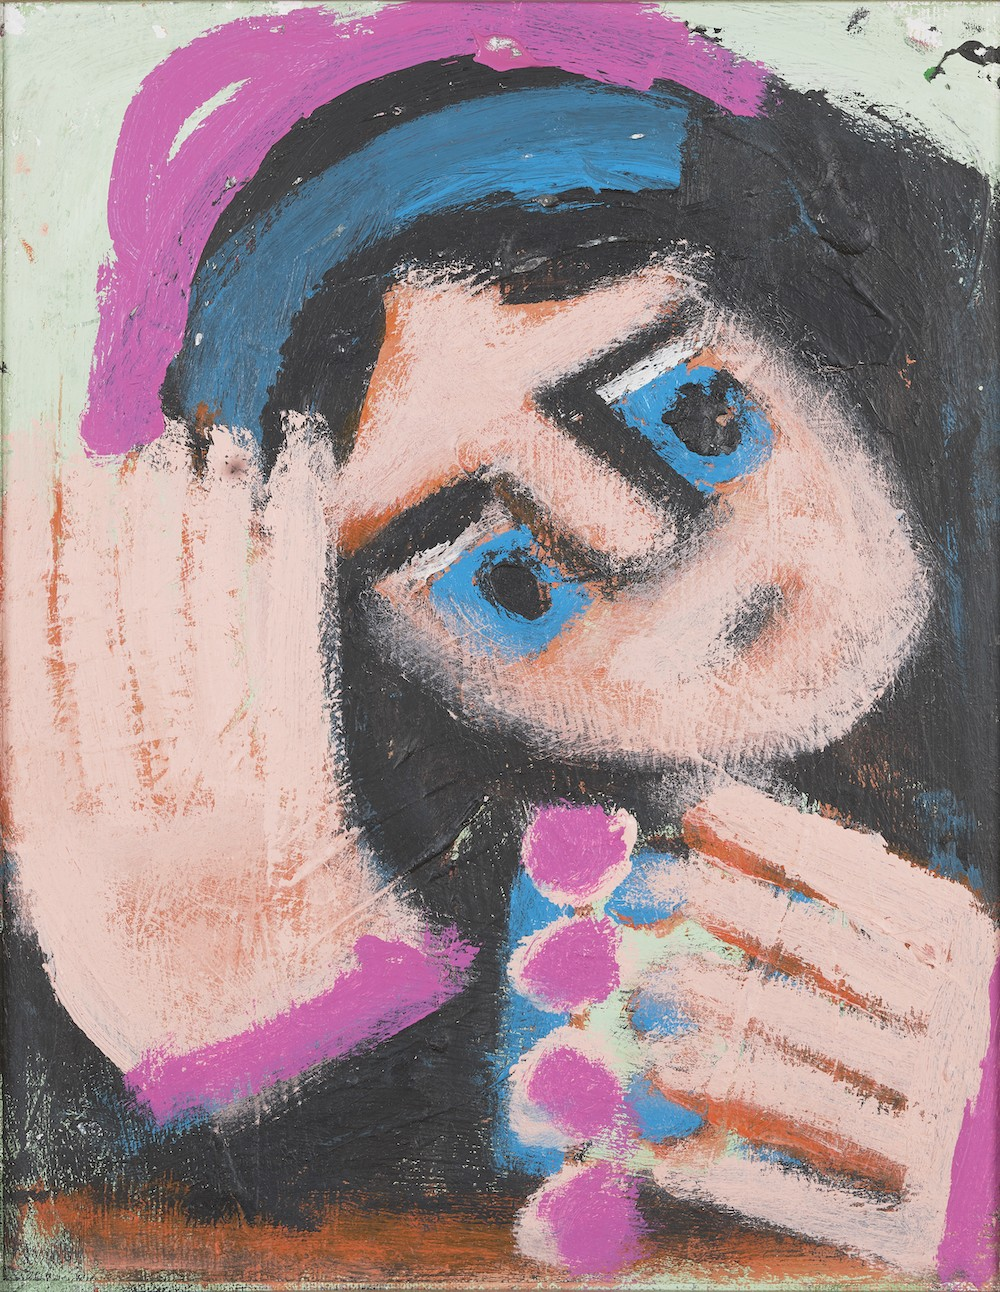 Mr. Eddy Mumma (American, 1908—1986), 'Untitled (The Afghan Girl, National Geographic 1985),' n.d. Acrylic on canvas board. Collection of the Mennello Museum of American Art, Gift of Josh Feldstein, 2015-001-001a,b. © Josh Feldstein